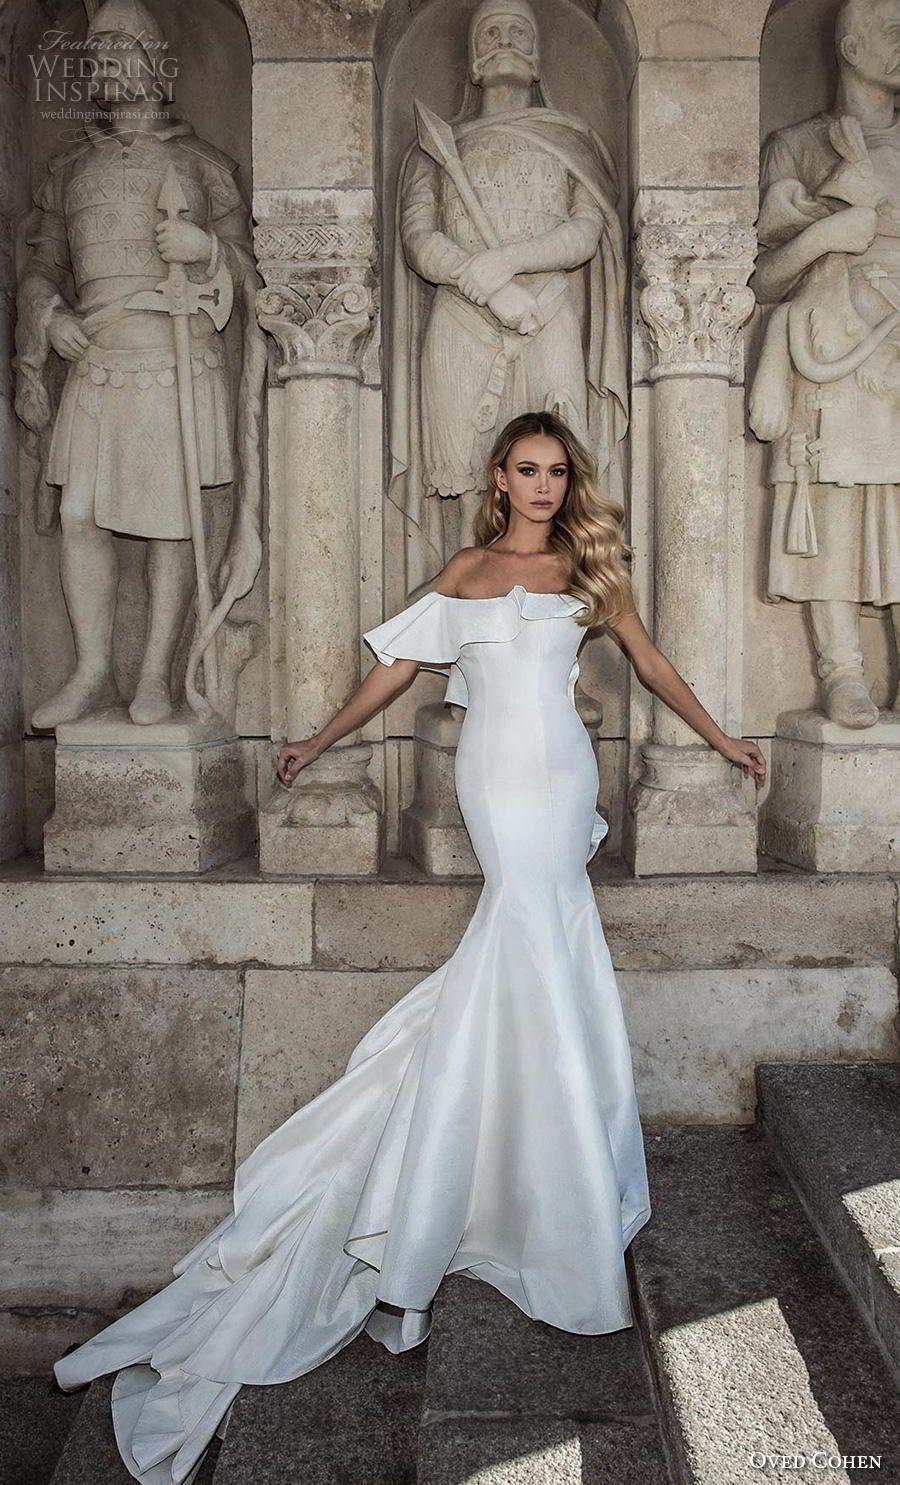 Oved Cohen 2018 Wedding Dresses Wedding Inspirasi Beach Wedding Dresses Backless Wedding Dresses Perfect Wedding Dress [ 1485 x 900 Pixel ]